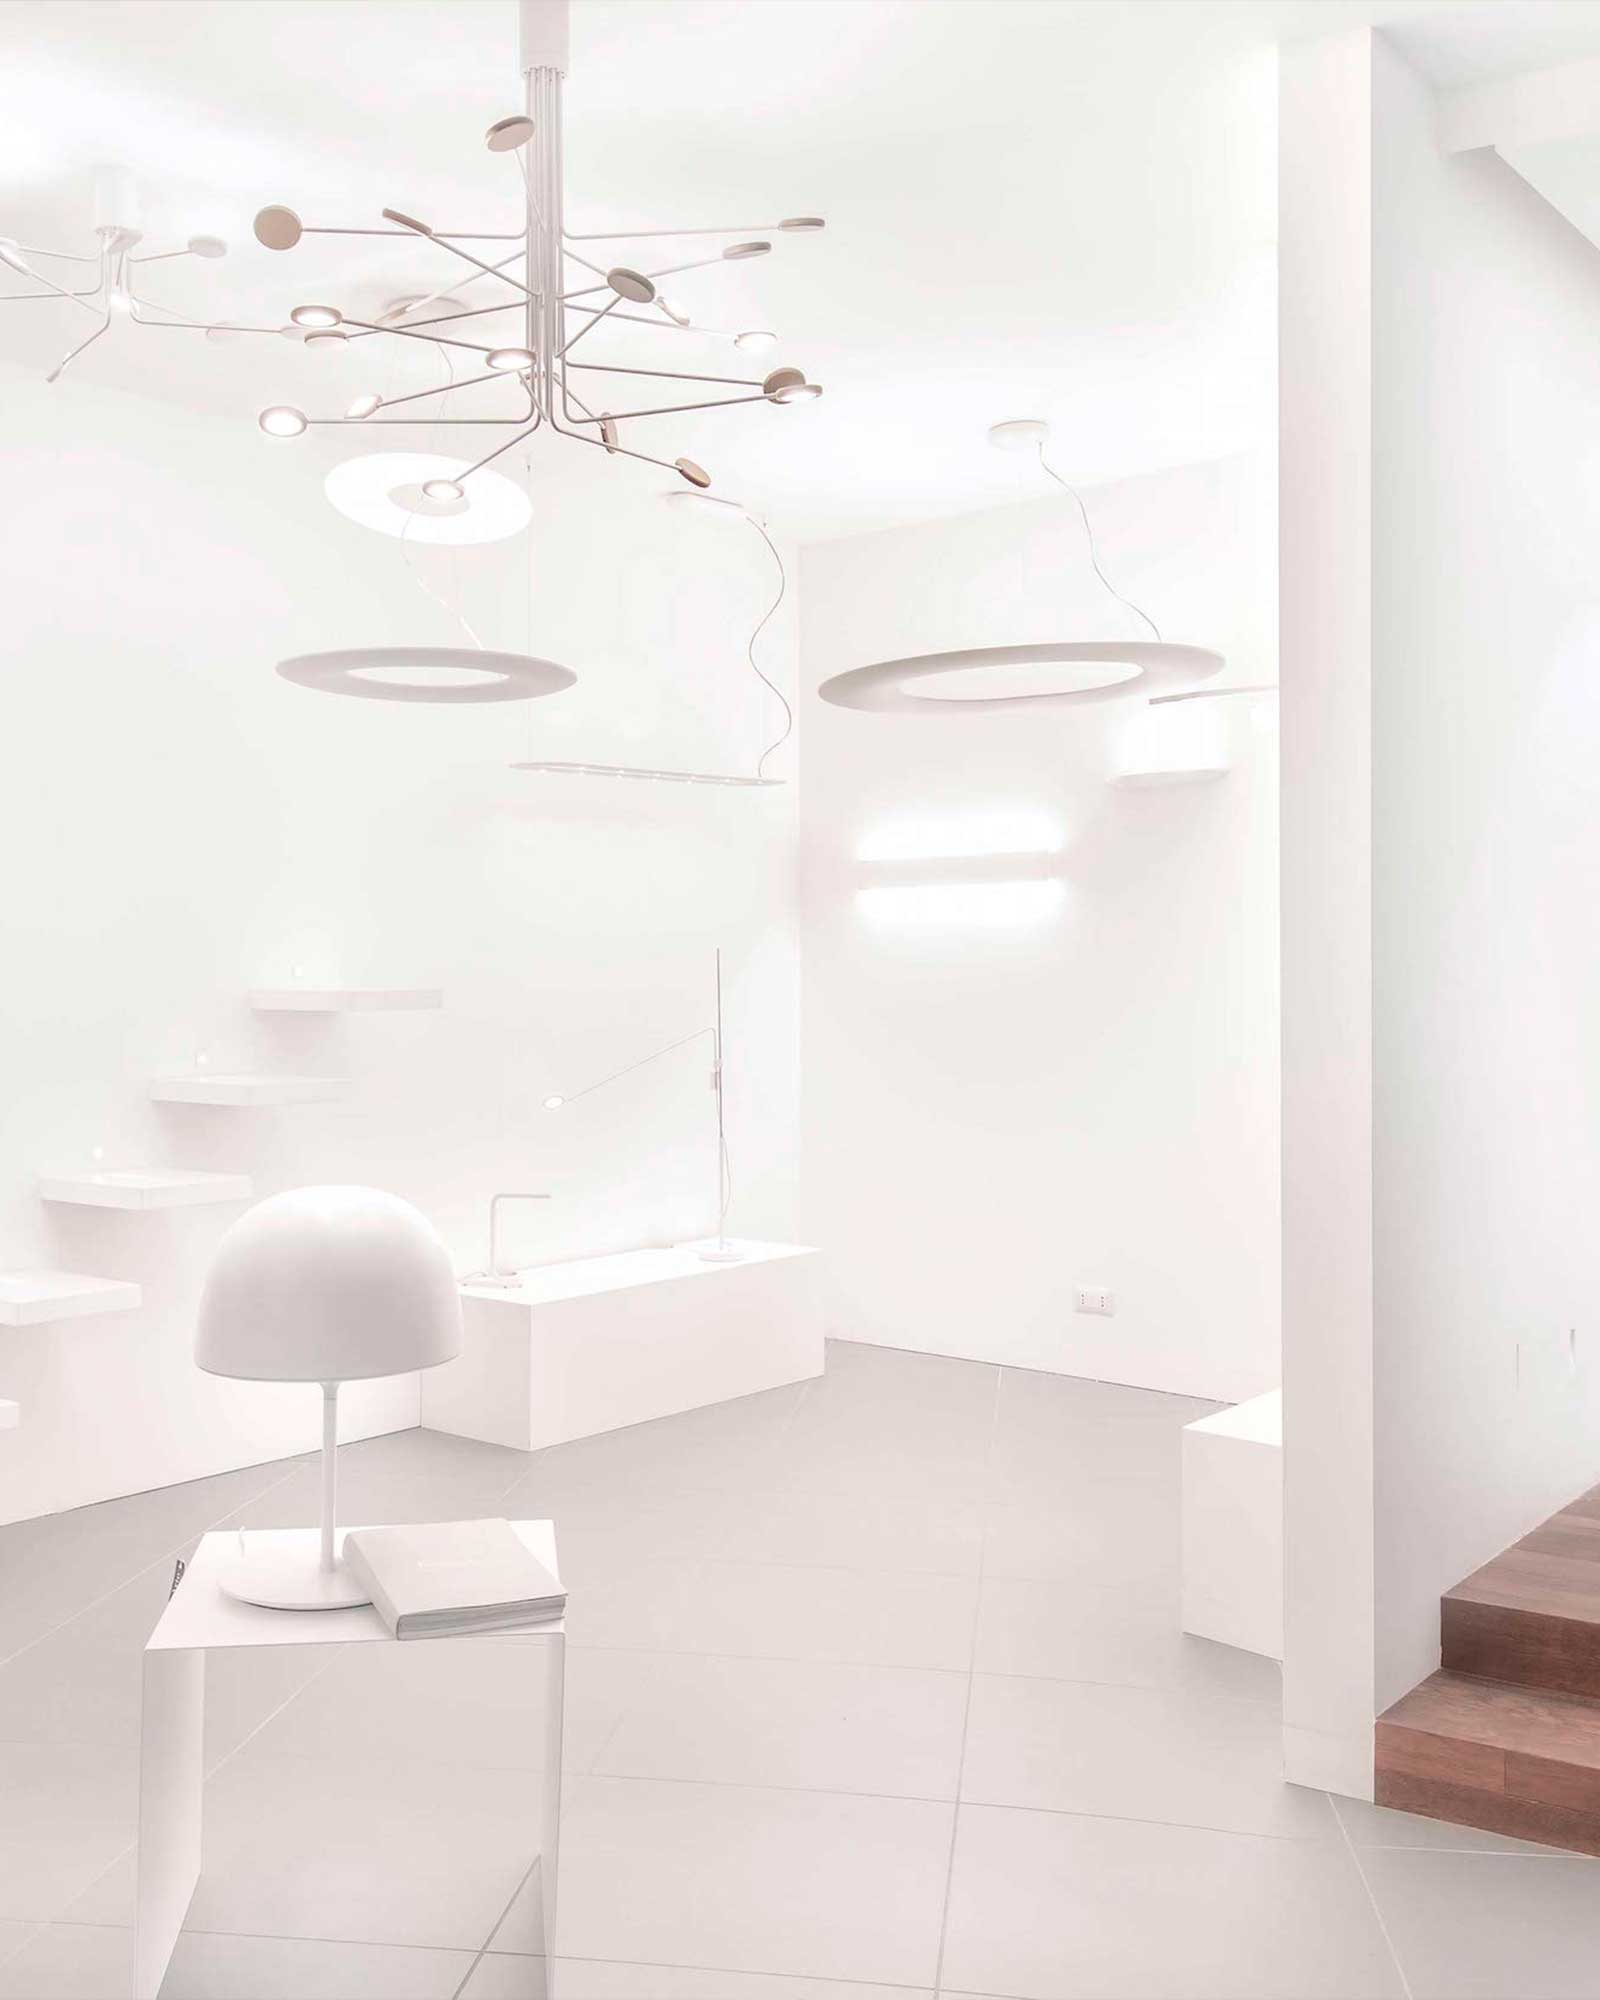 Lampadario Con Punto Luce Decentrato vendita lampadari e lampade venezia | guerra lampadari